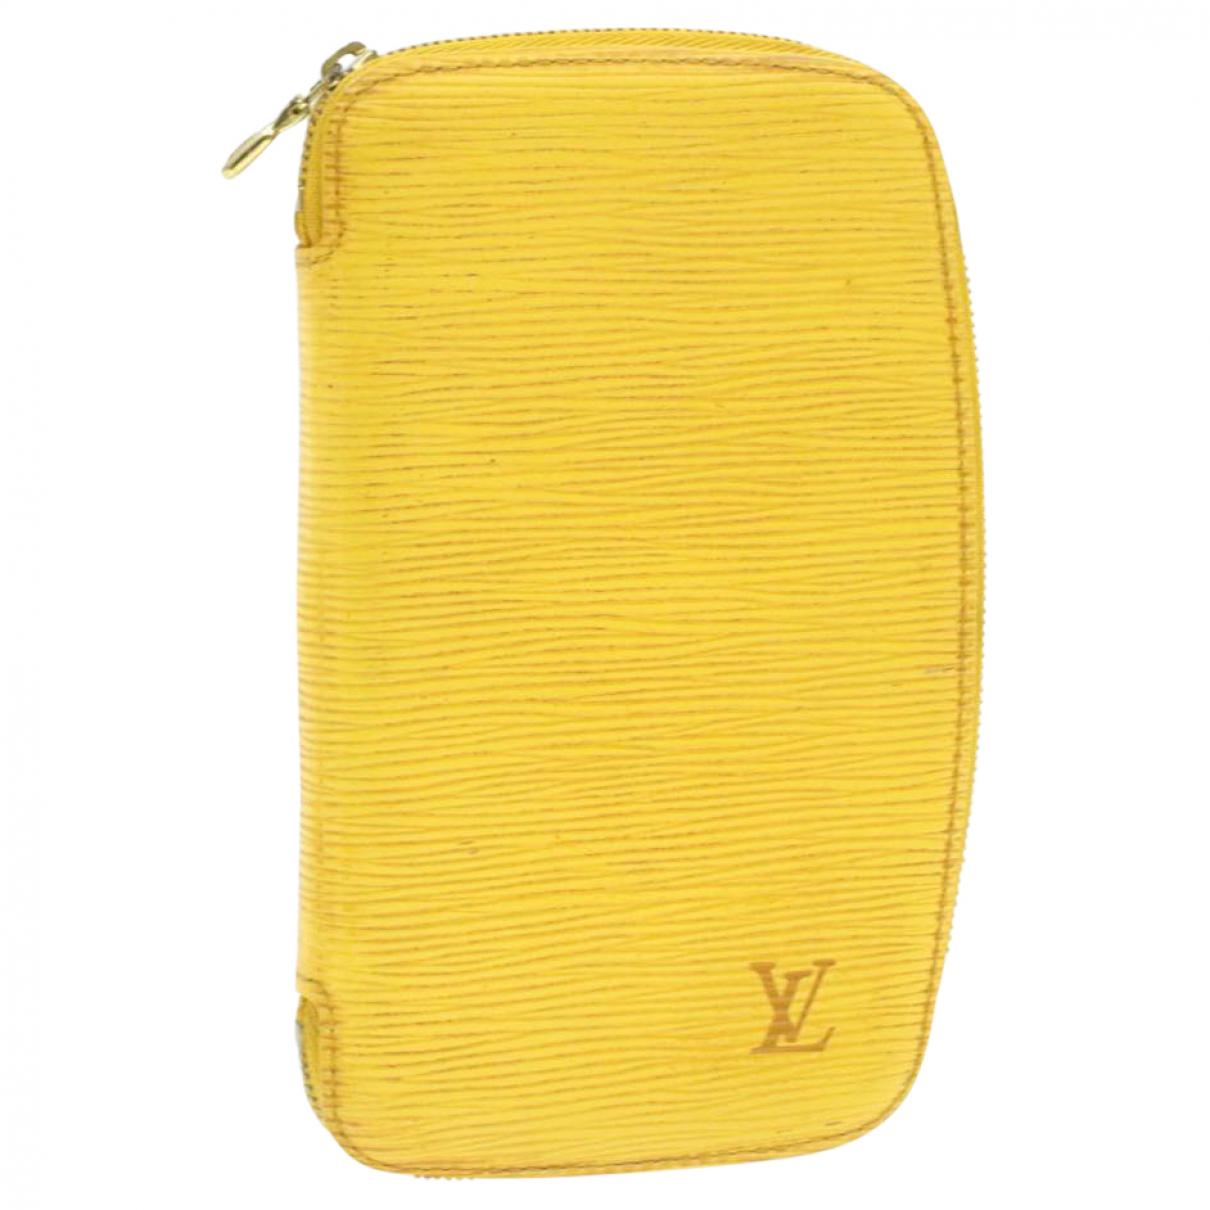 Louis Vuitton \N Yellow scarf for Women \N